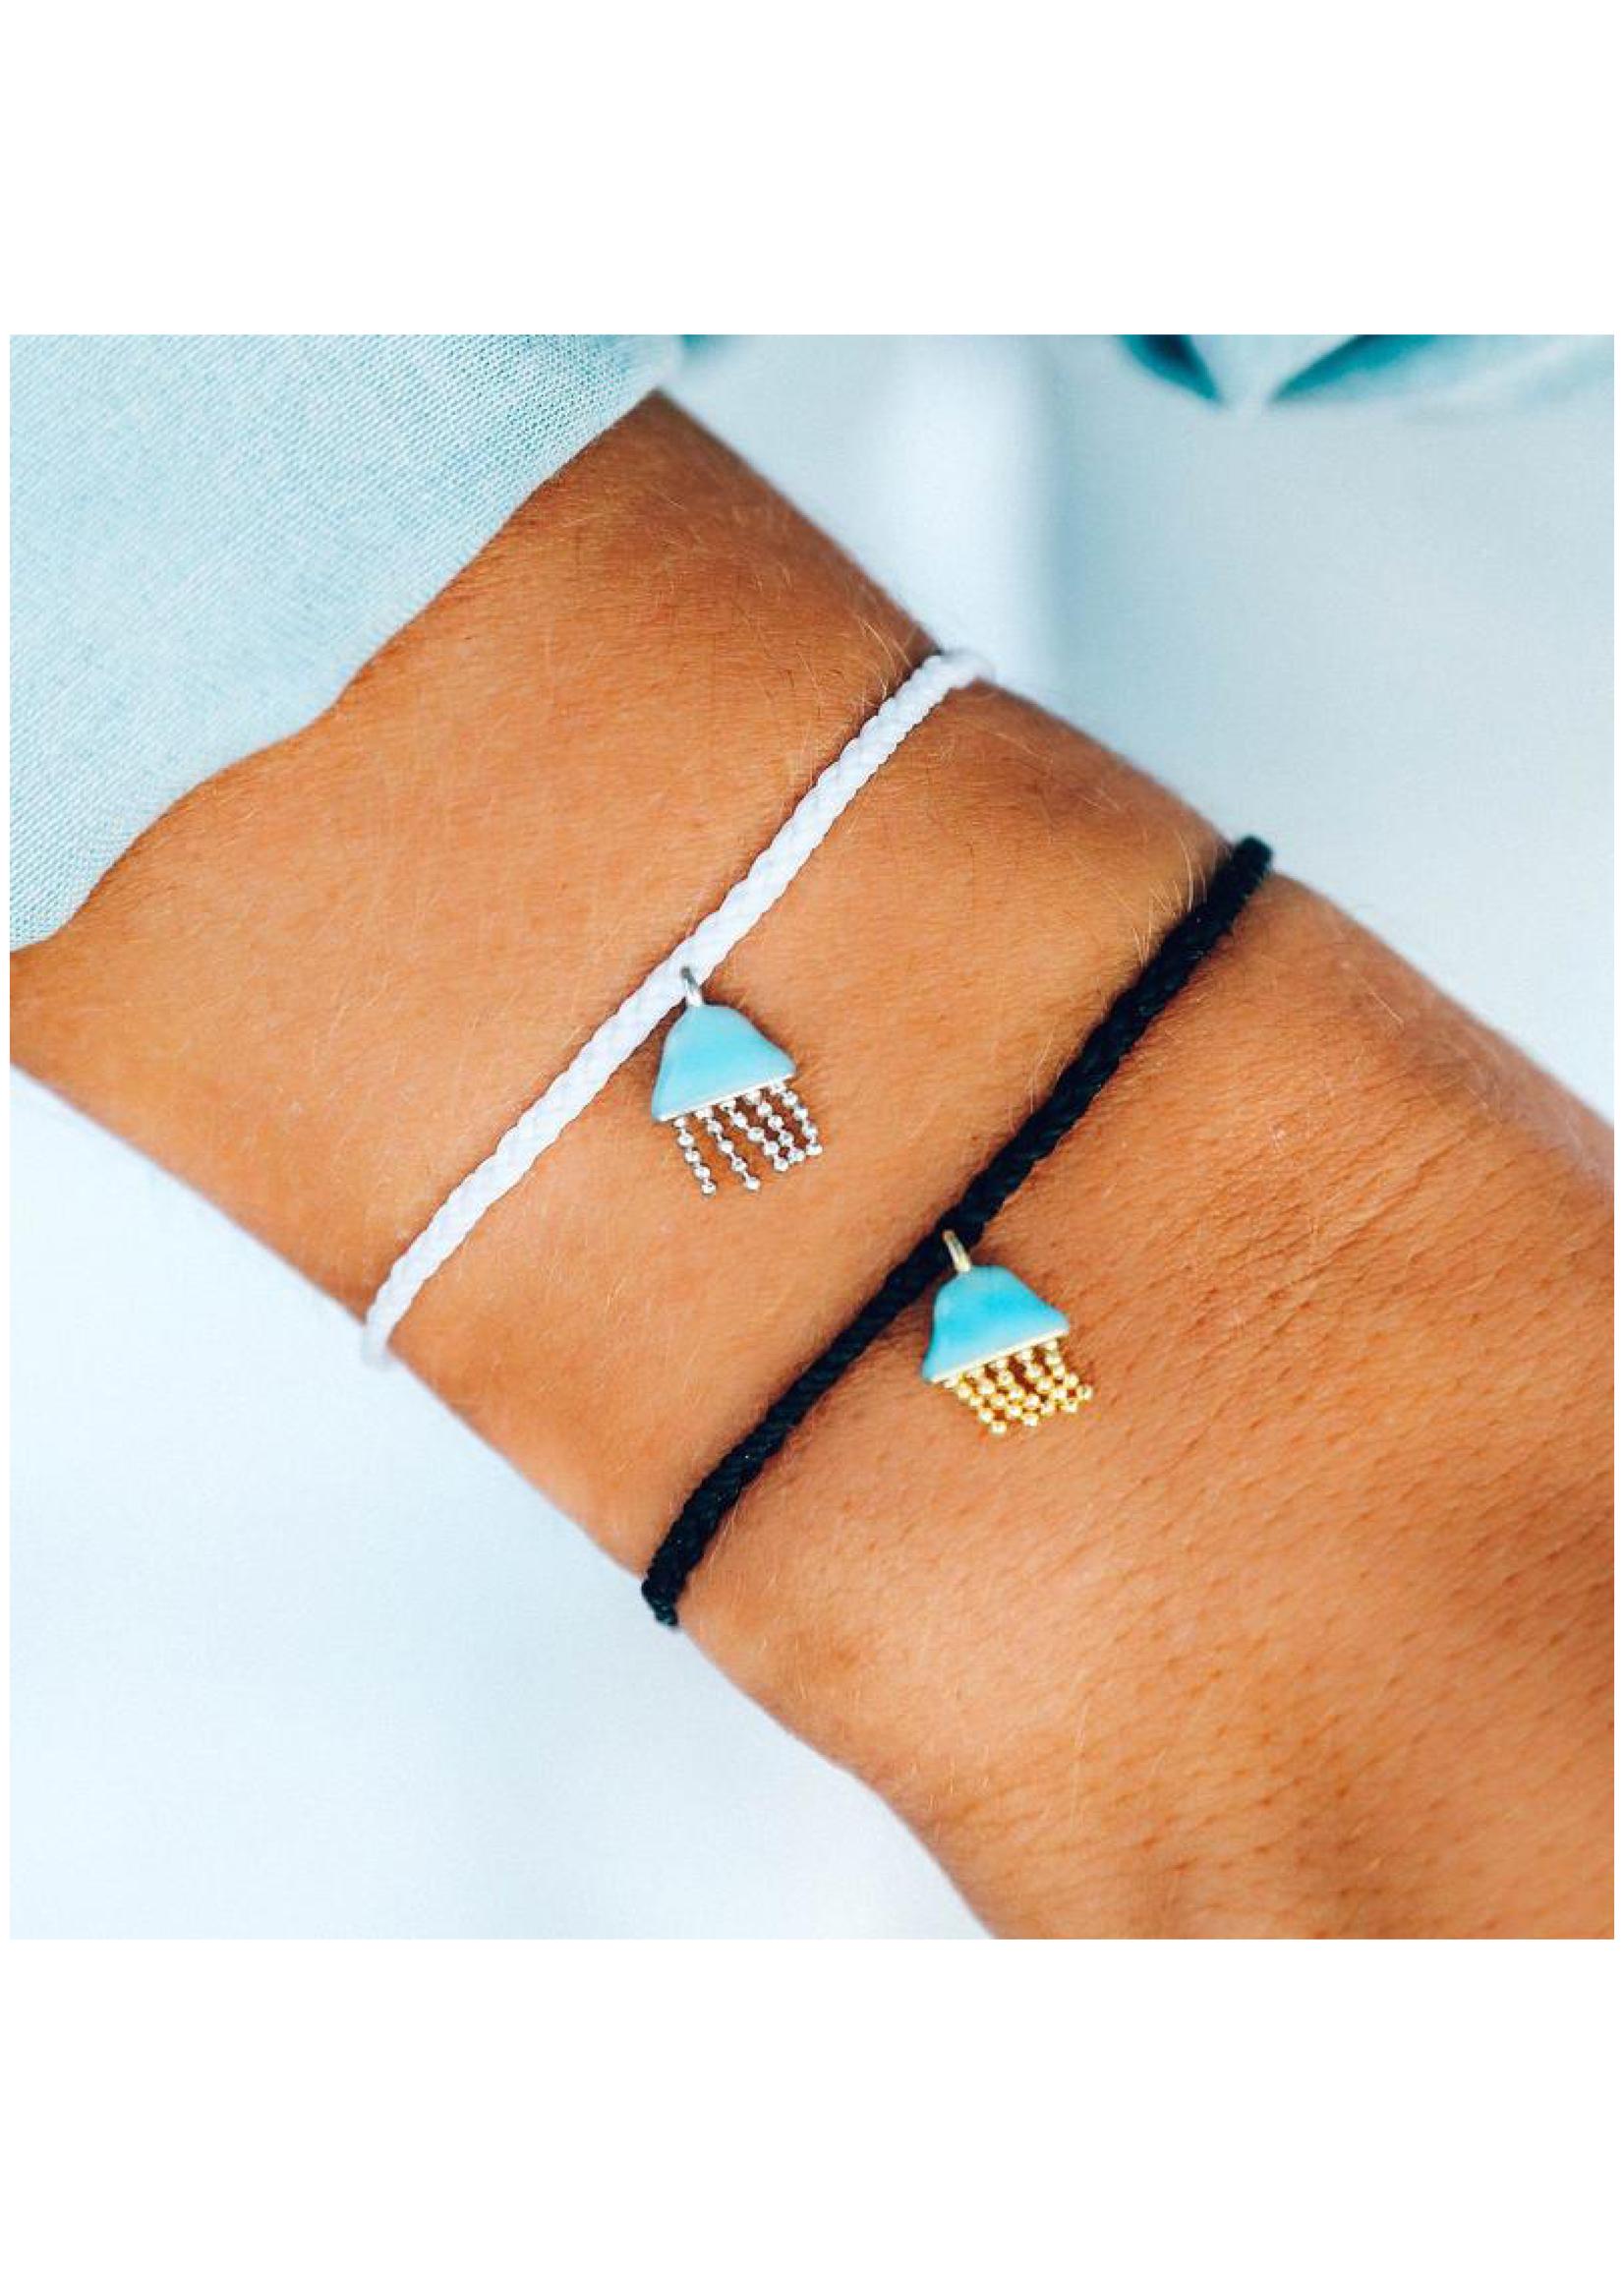 puravida bracelets Jellyfish Bracelet Black